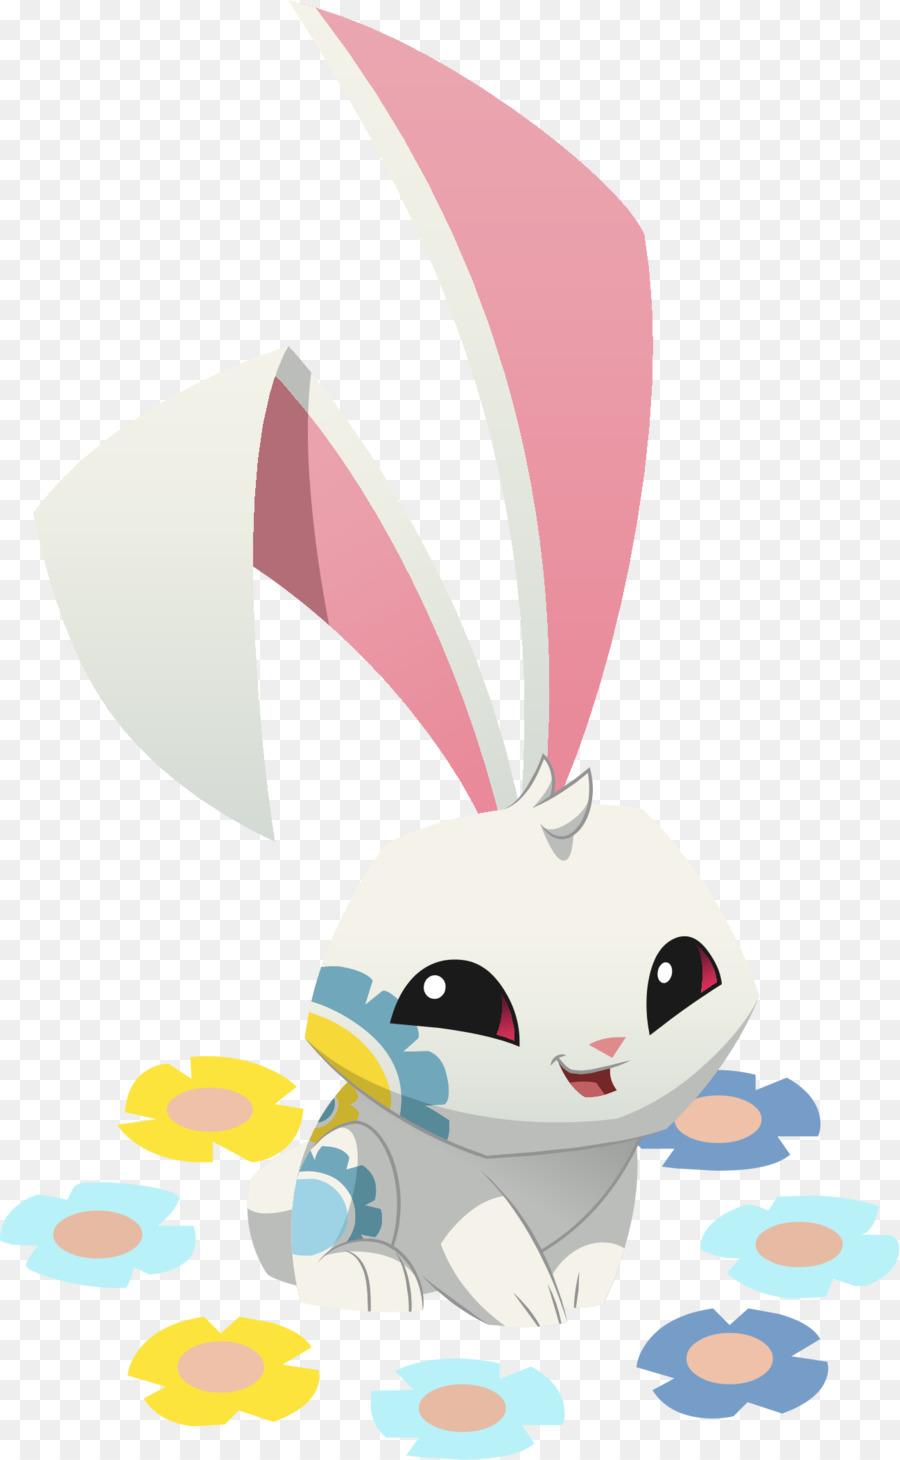 Image of: Keywords Easter Bunny Domestic Rabbit National Geographic Animal Jam Clip Art Jam Uebeautymaestroco Easter Bunny Domestic Rabbit National Geographic Animal Jam Clip Art